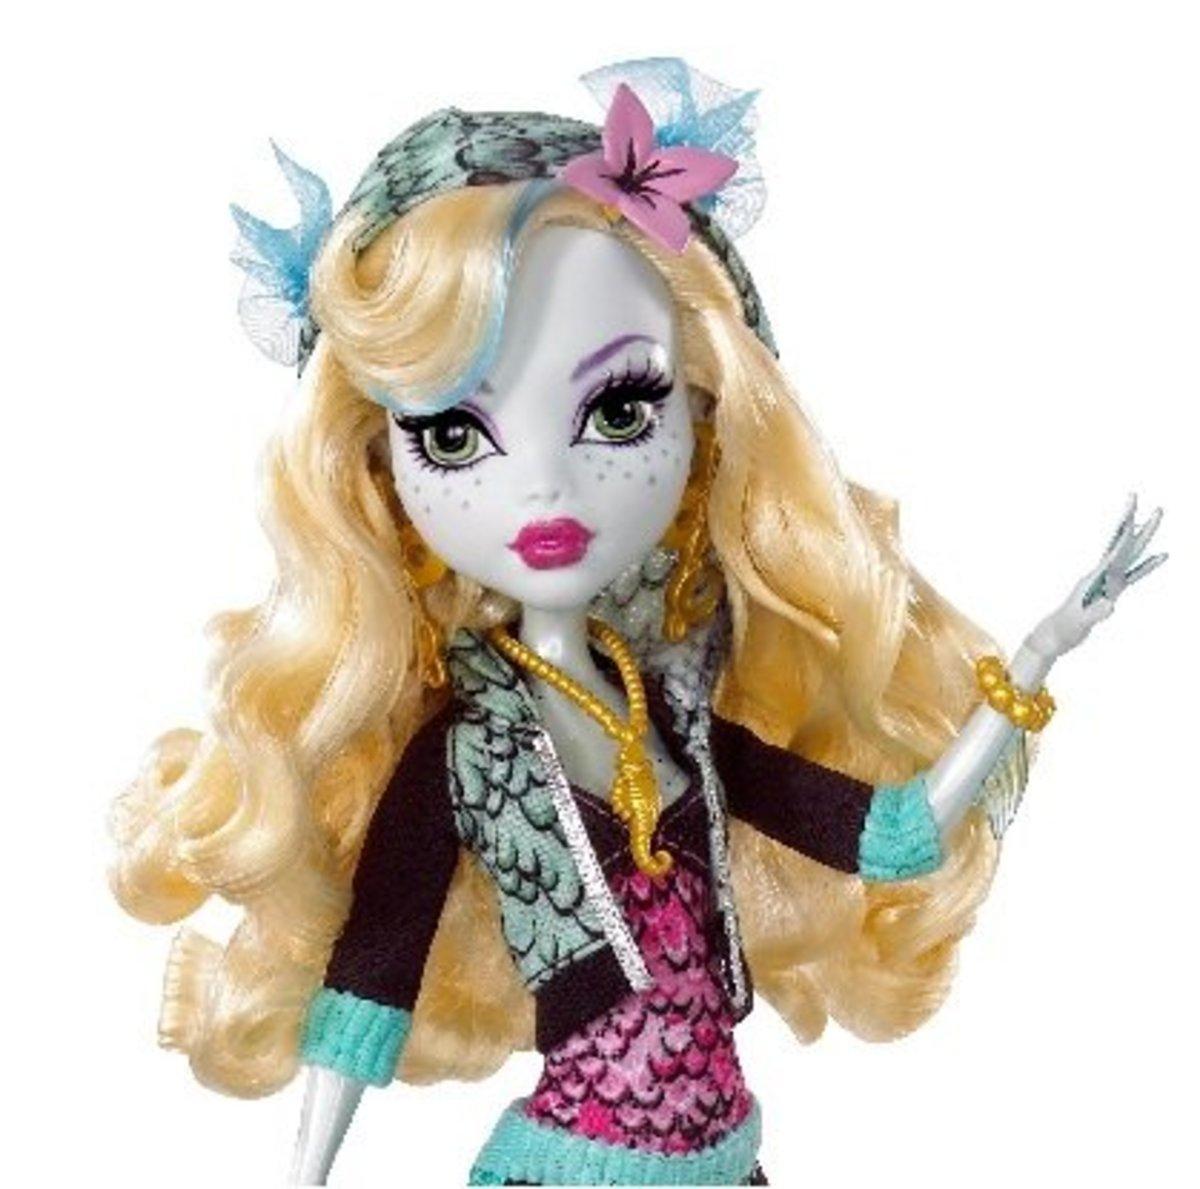 Monster High Lagoona Blue Dolls  Complete List Of Dolls  HubPages